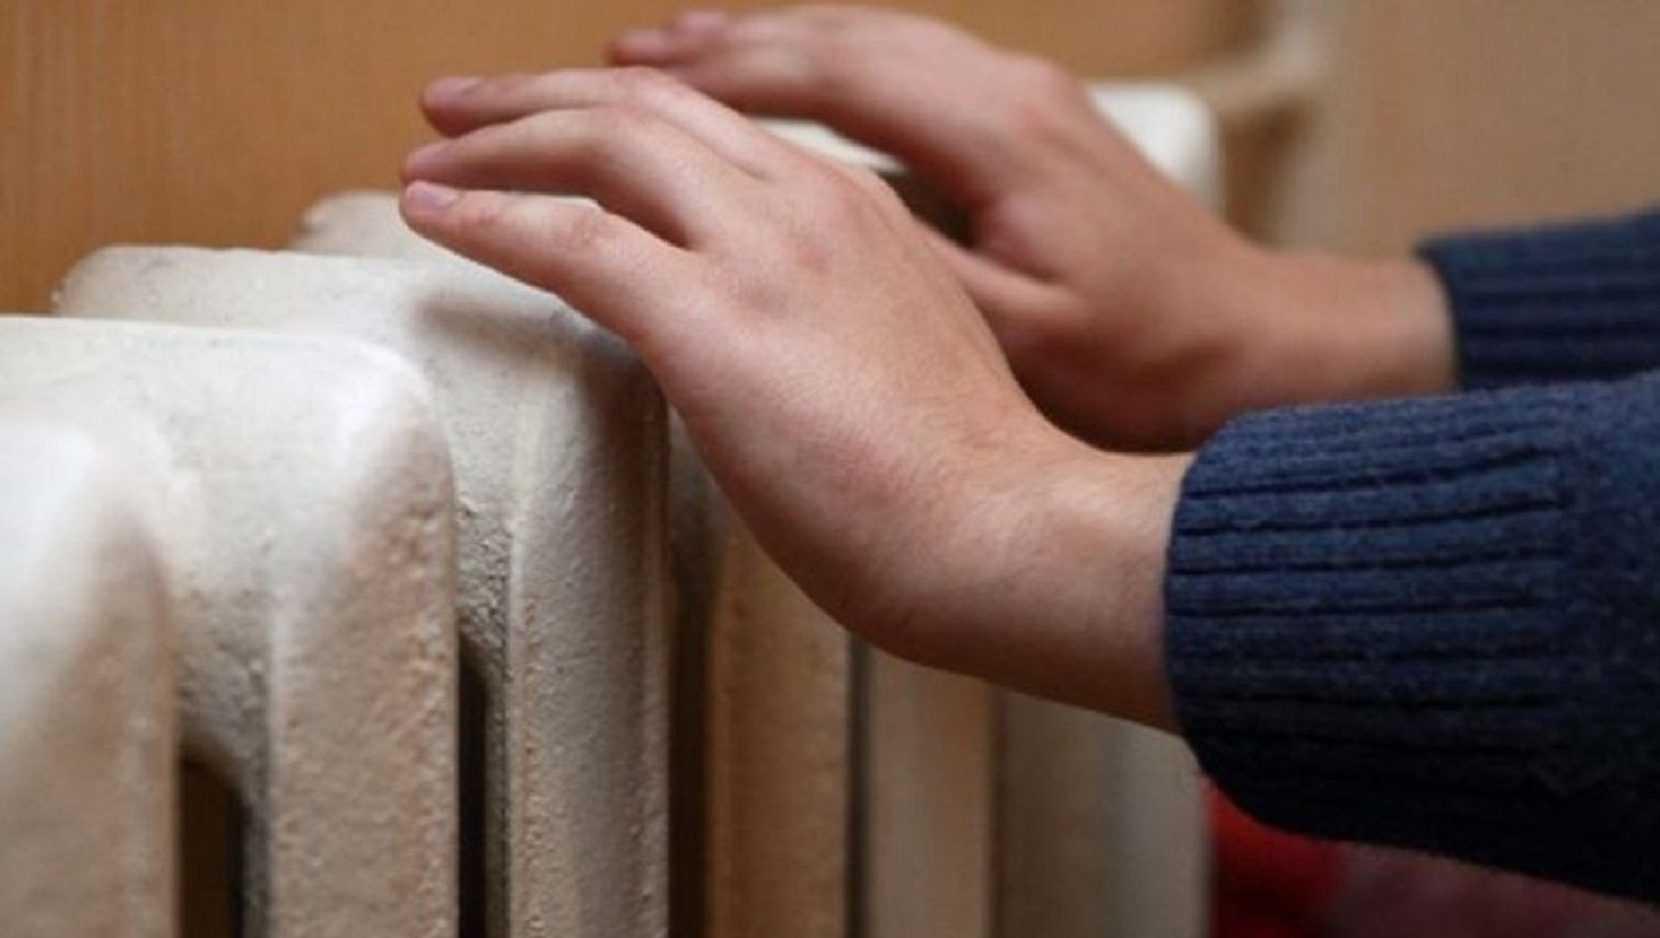 Число жалоб на холод в квартирах в Брянске выросло